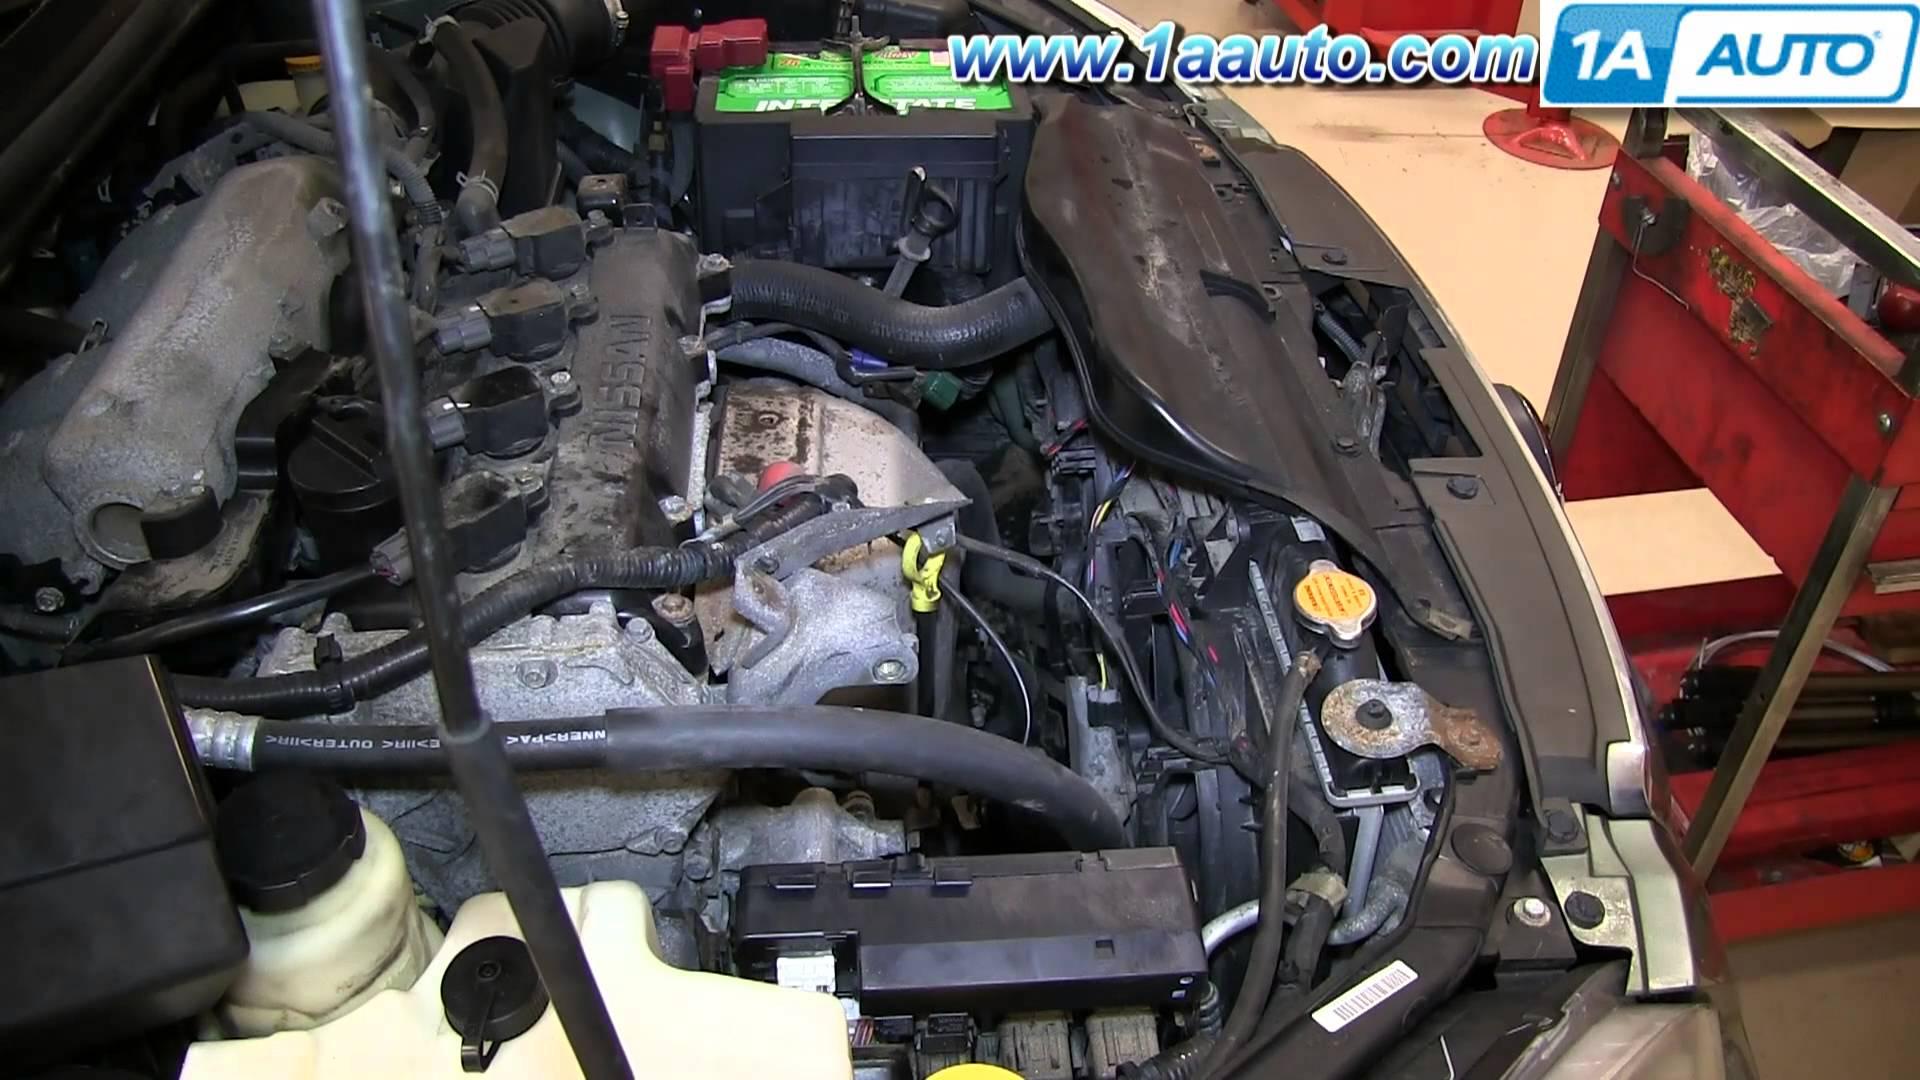 Nissan Altima Battery And Emergency Brake Light On